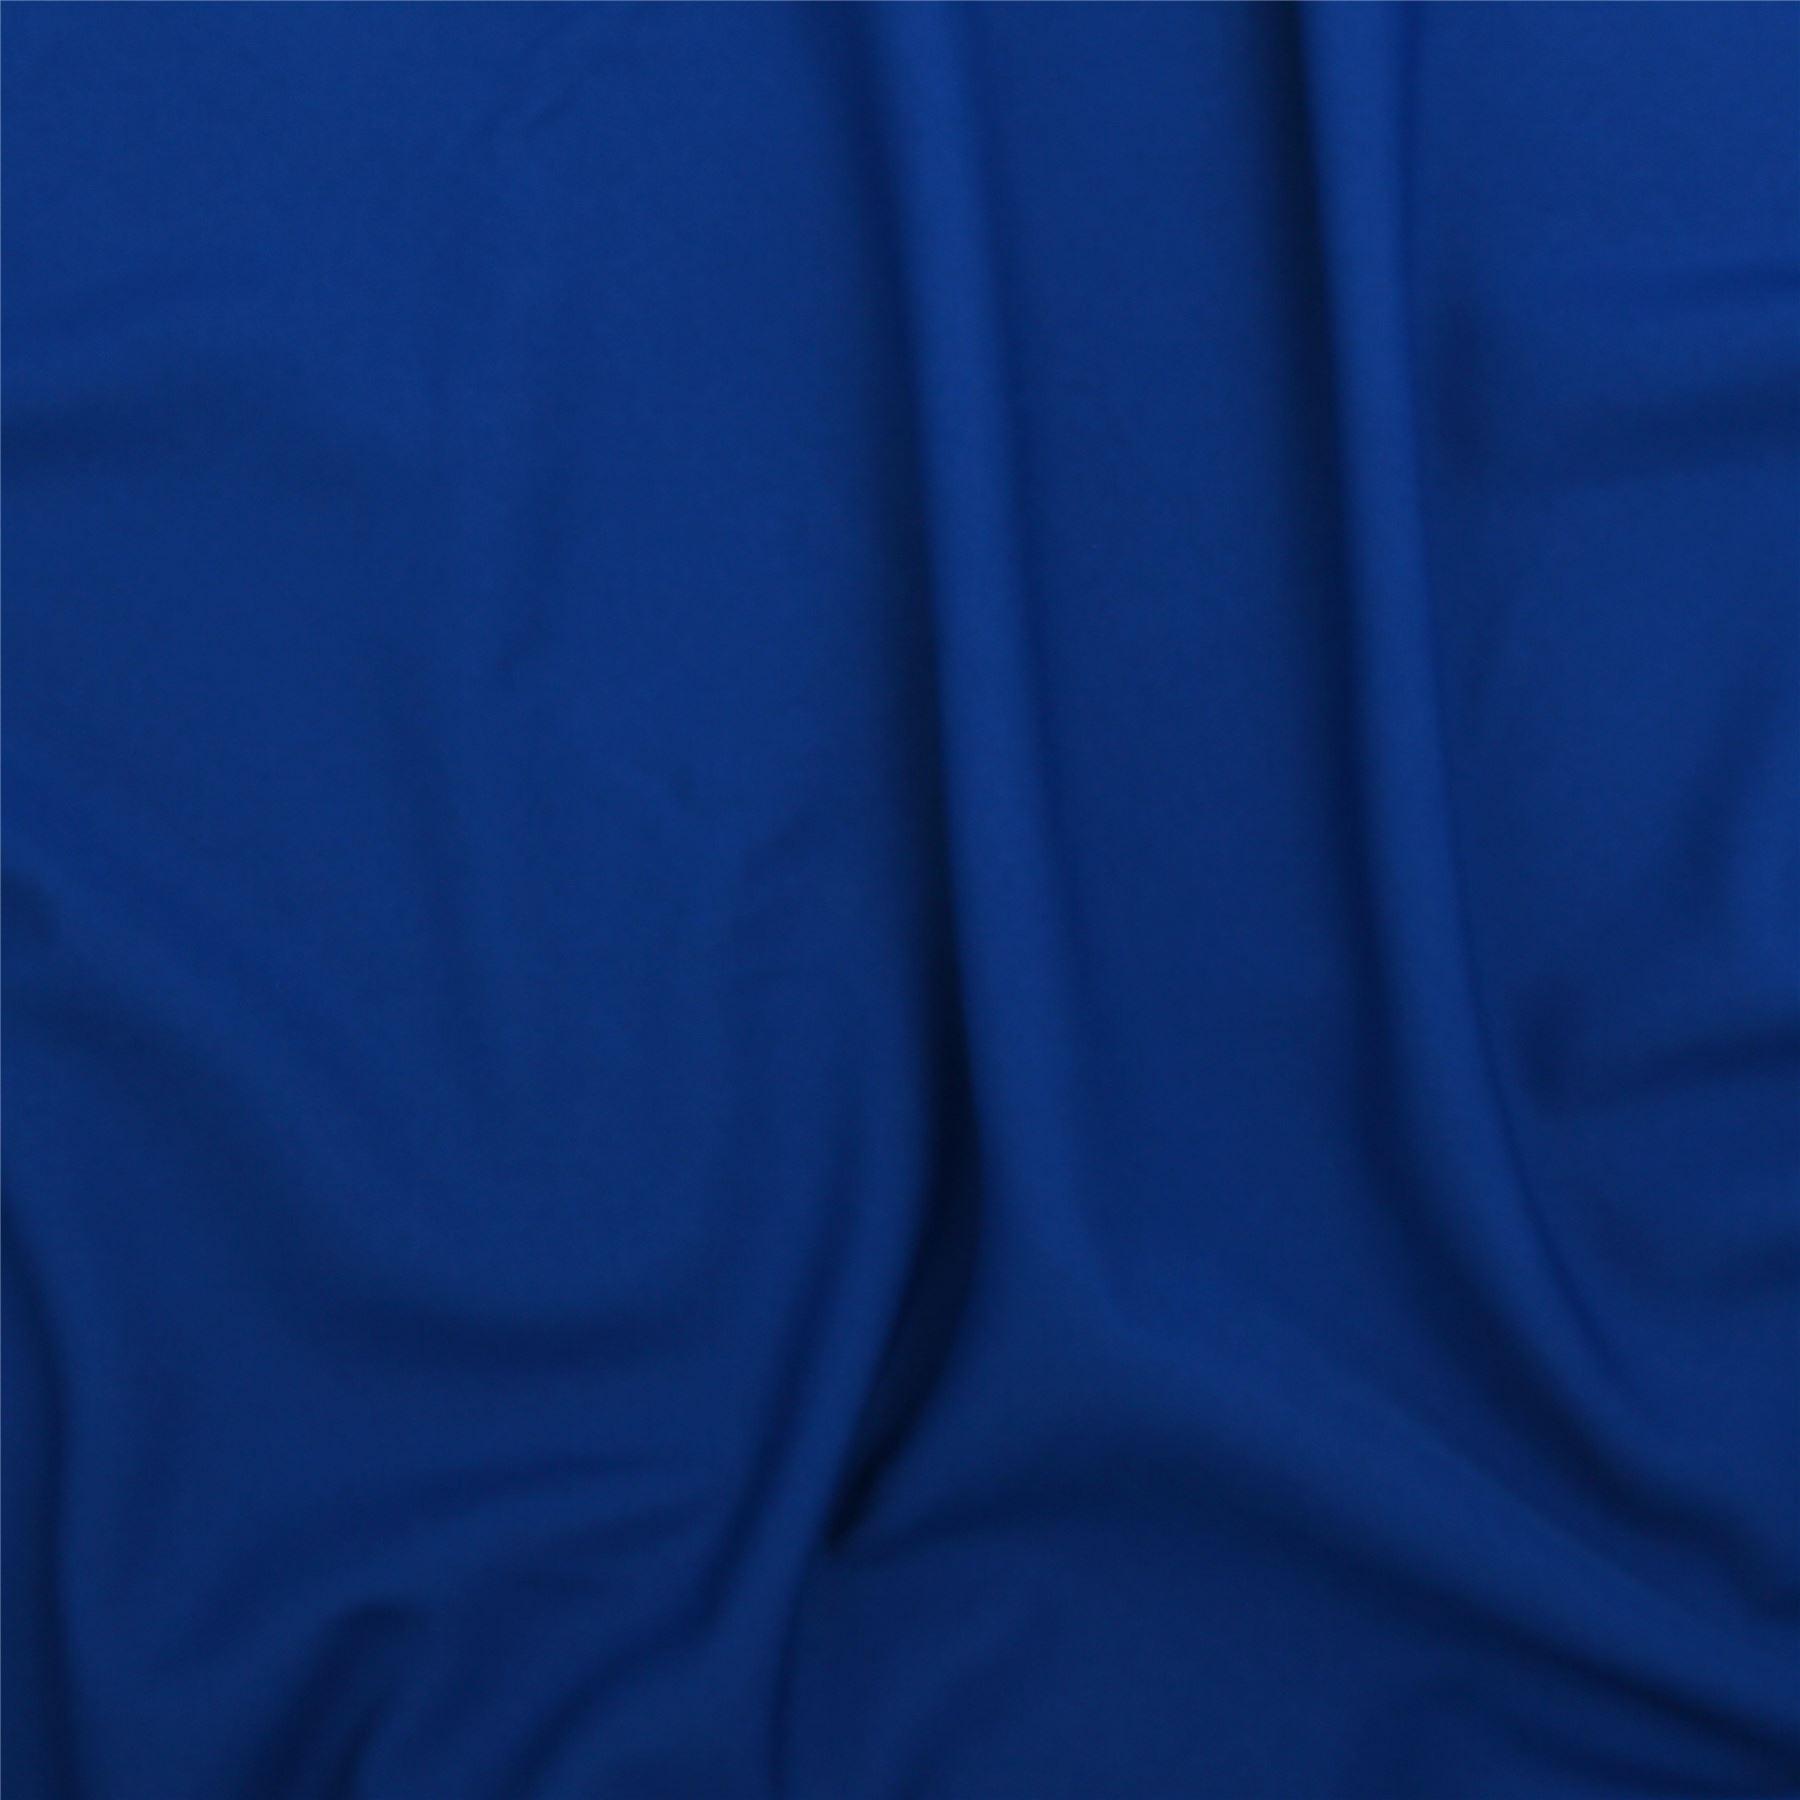 LIGHTWEIGHT BI STRETCH PANAMA DRESS DRAPPING MULTIPURPOSE POLYESTER FABRIC